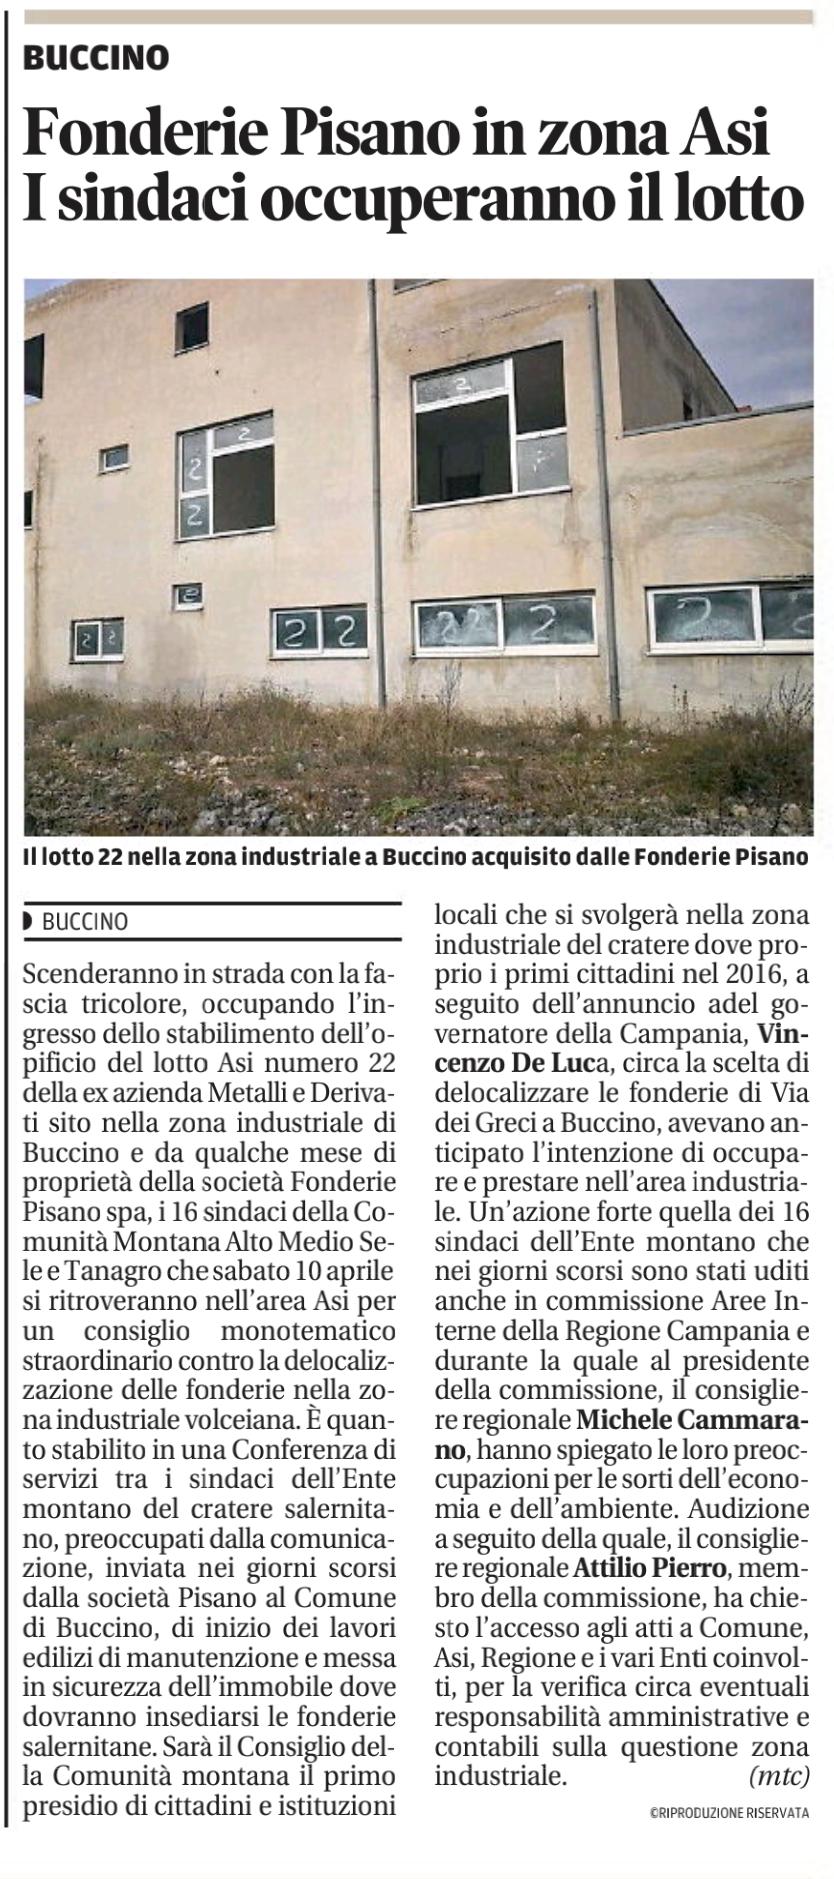 Fonderie Pisano a Buccino: Sindaci occupano lotto ASI